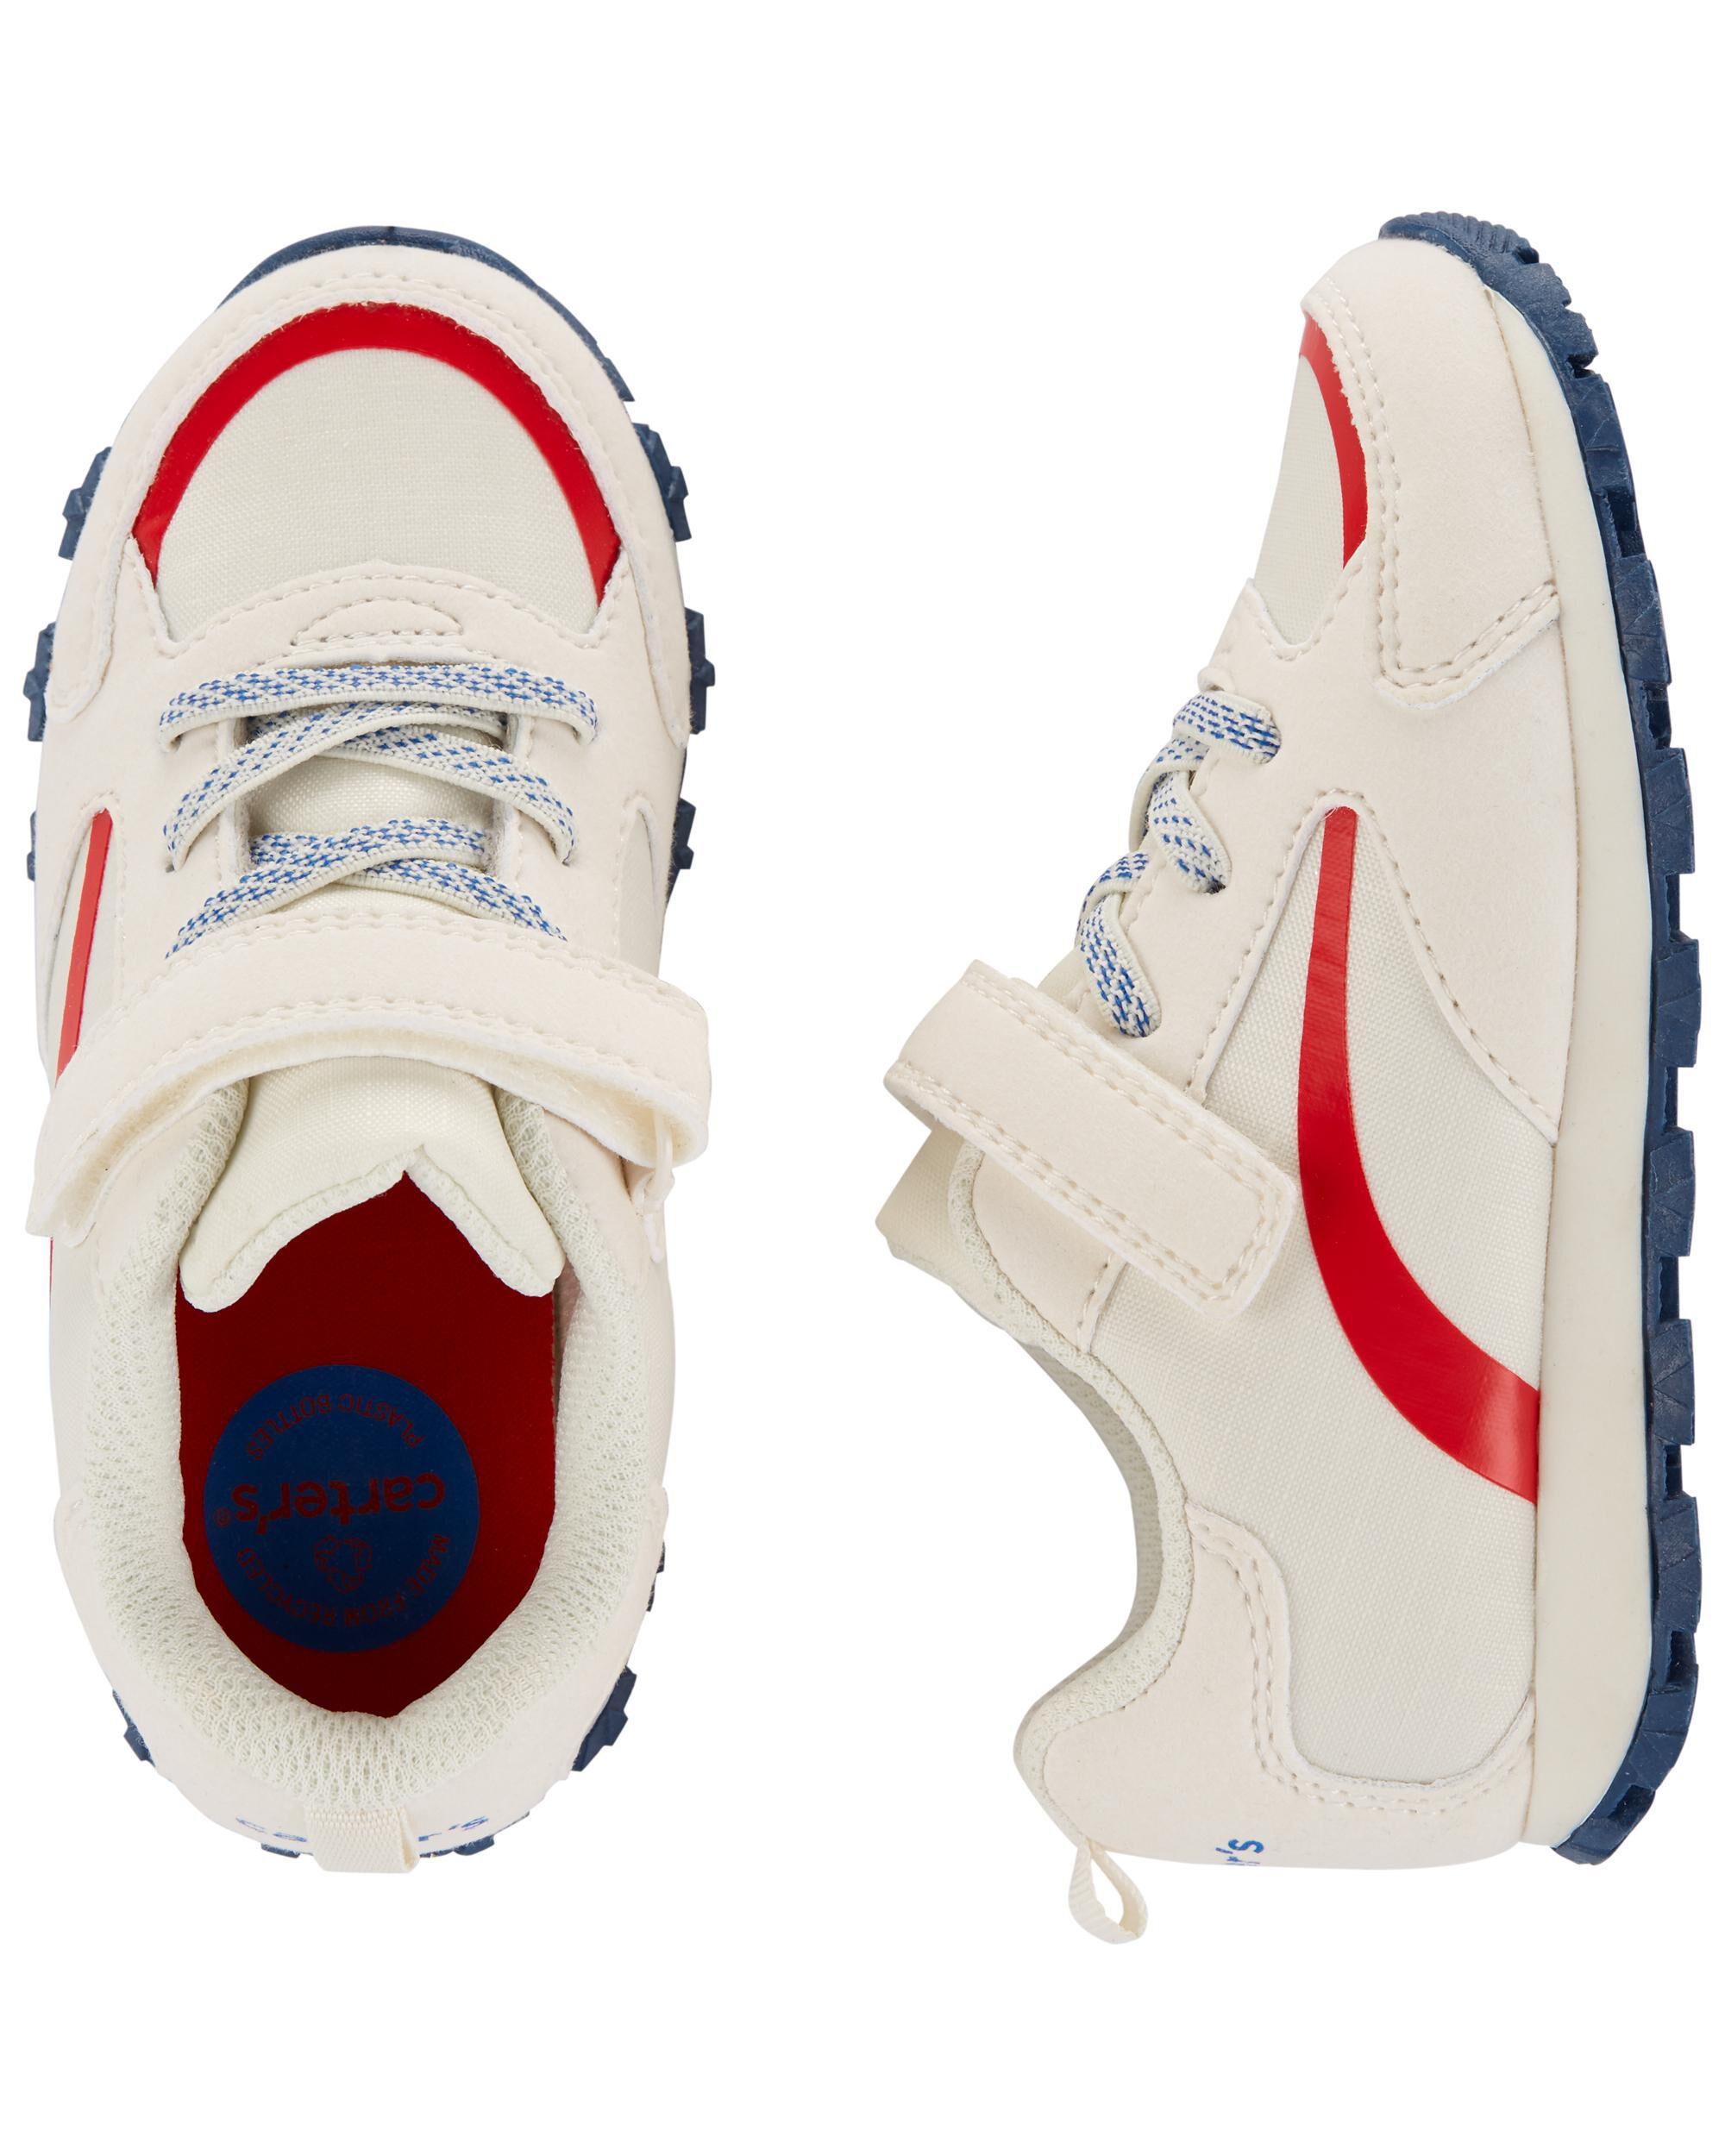 Carters Recycled Joey Sneakers